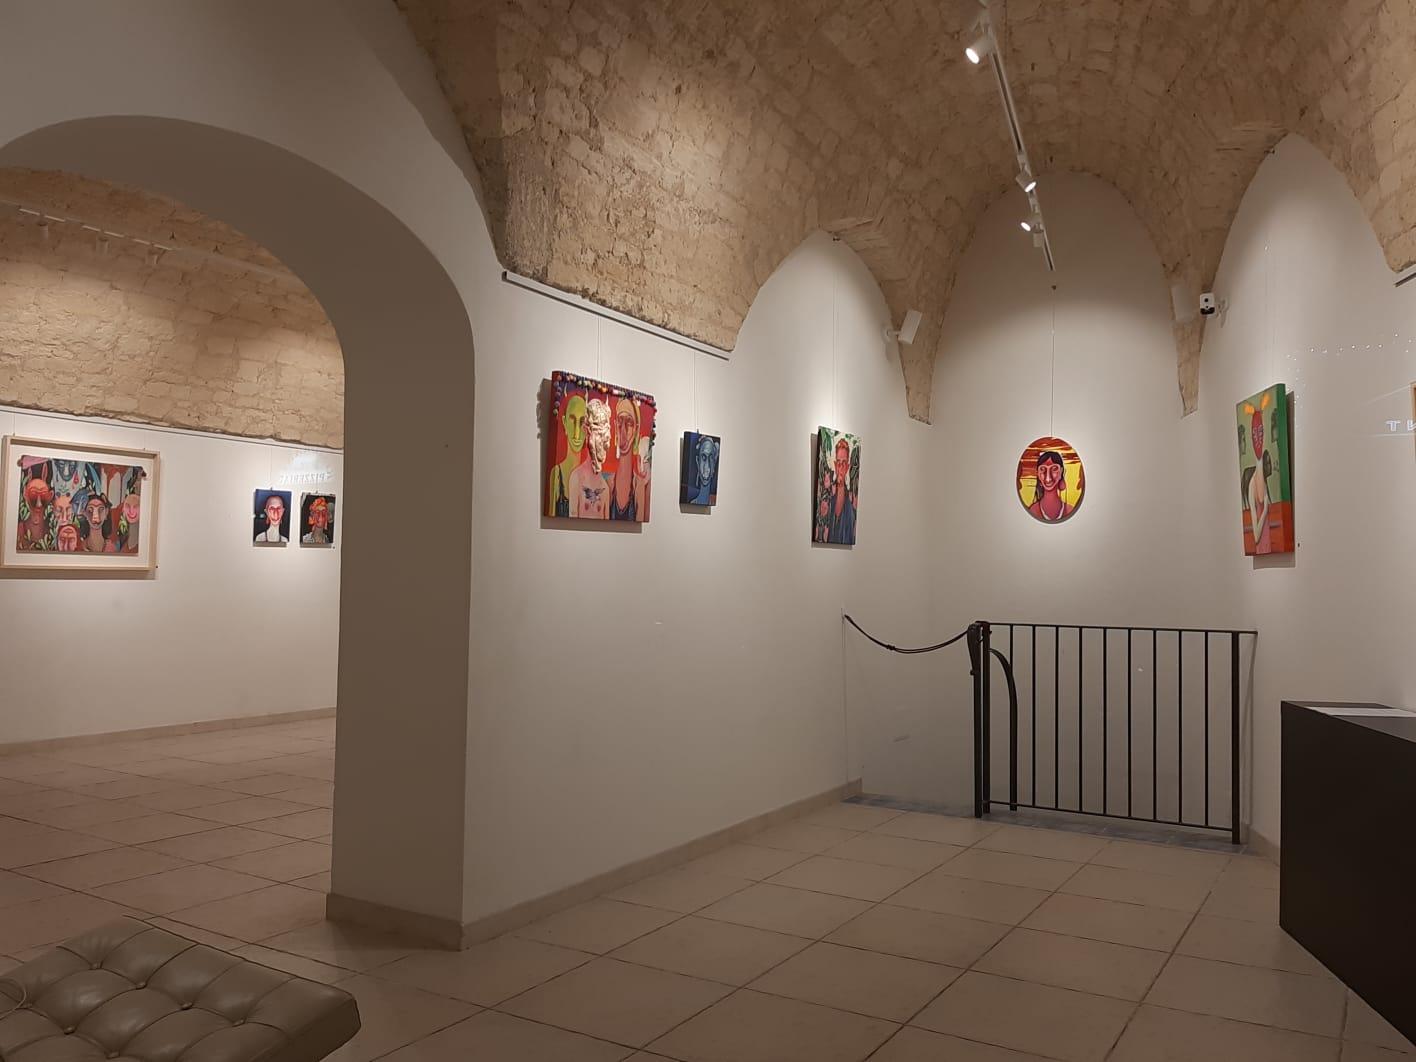 Silvia Mei, Dolcissime nevrosi, ArteCircuito, Sassari, installation view